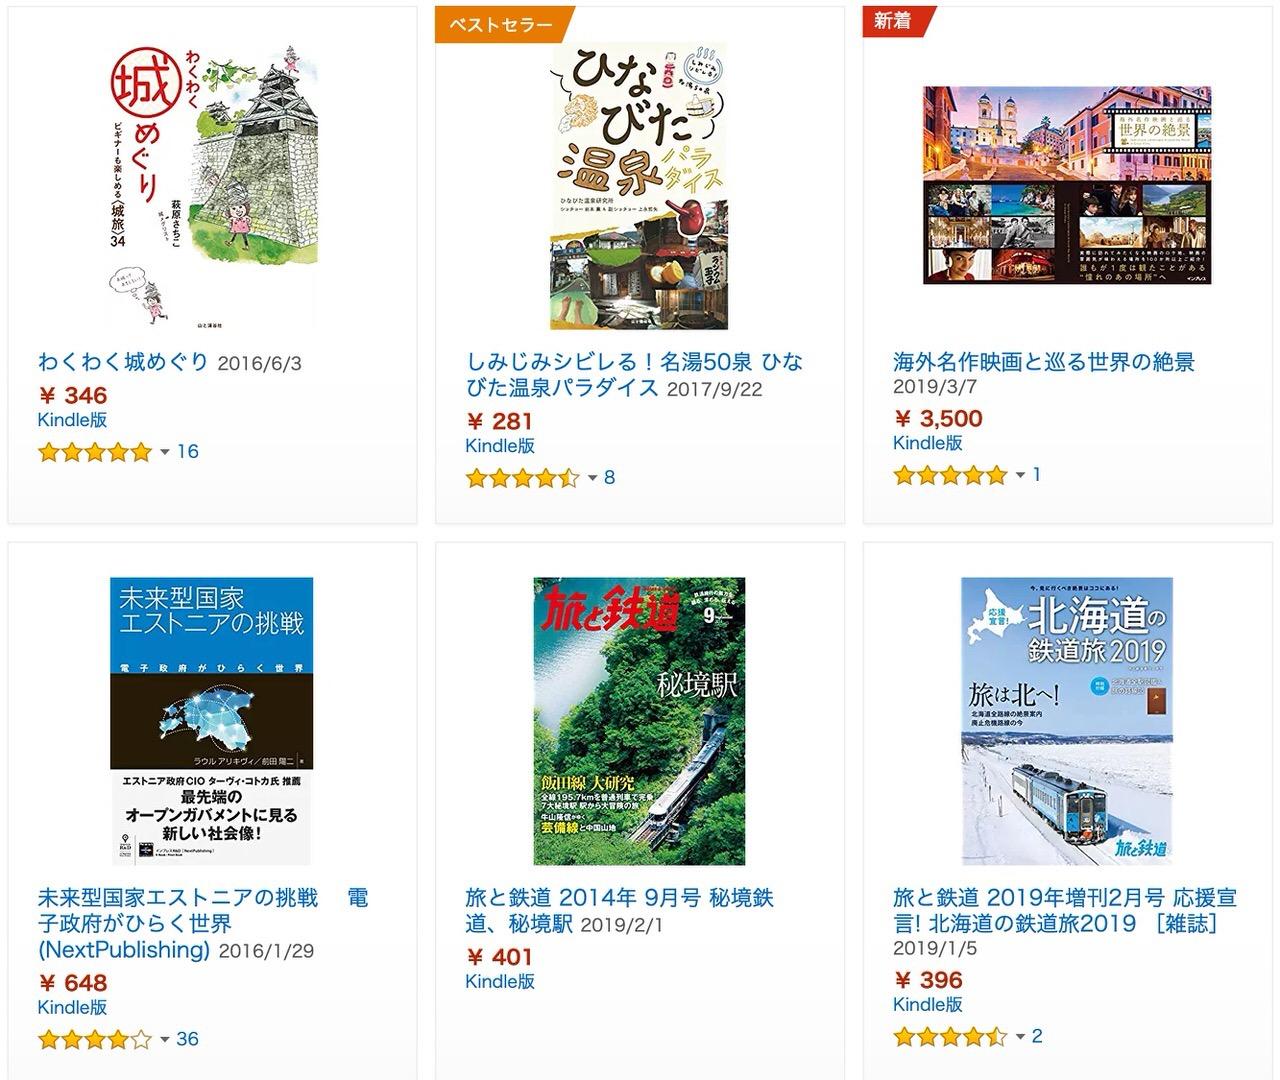 【Kindleセール】城巡りに温泉、絶景、アニメと鉄道「春の旅行本フェア」(3/14まで)